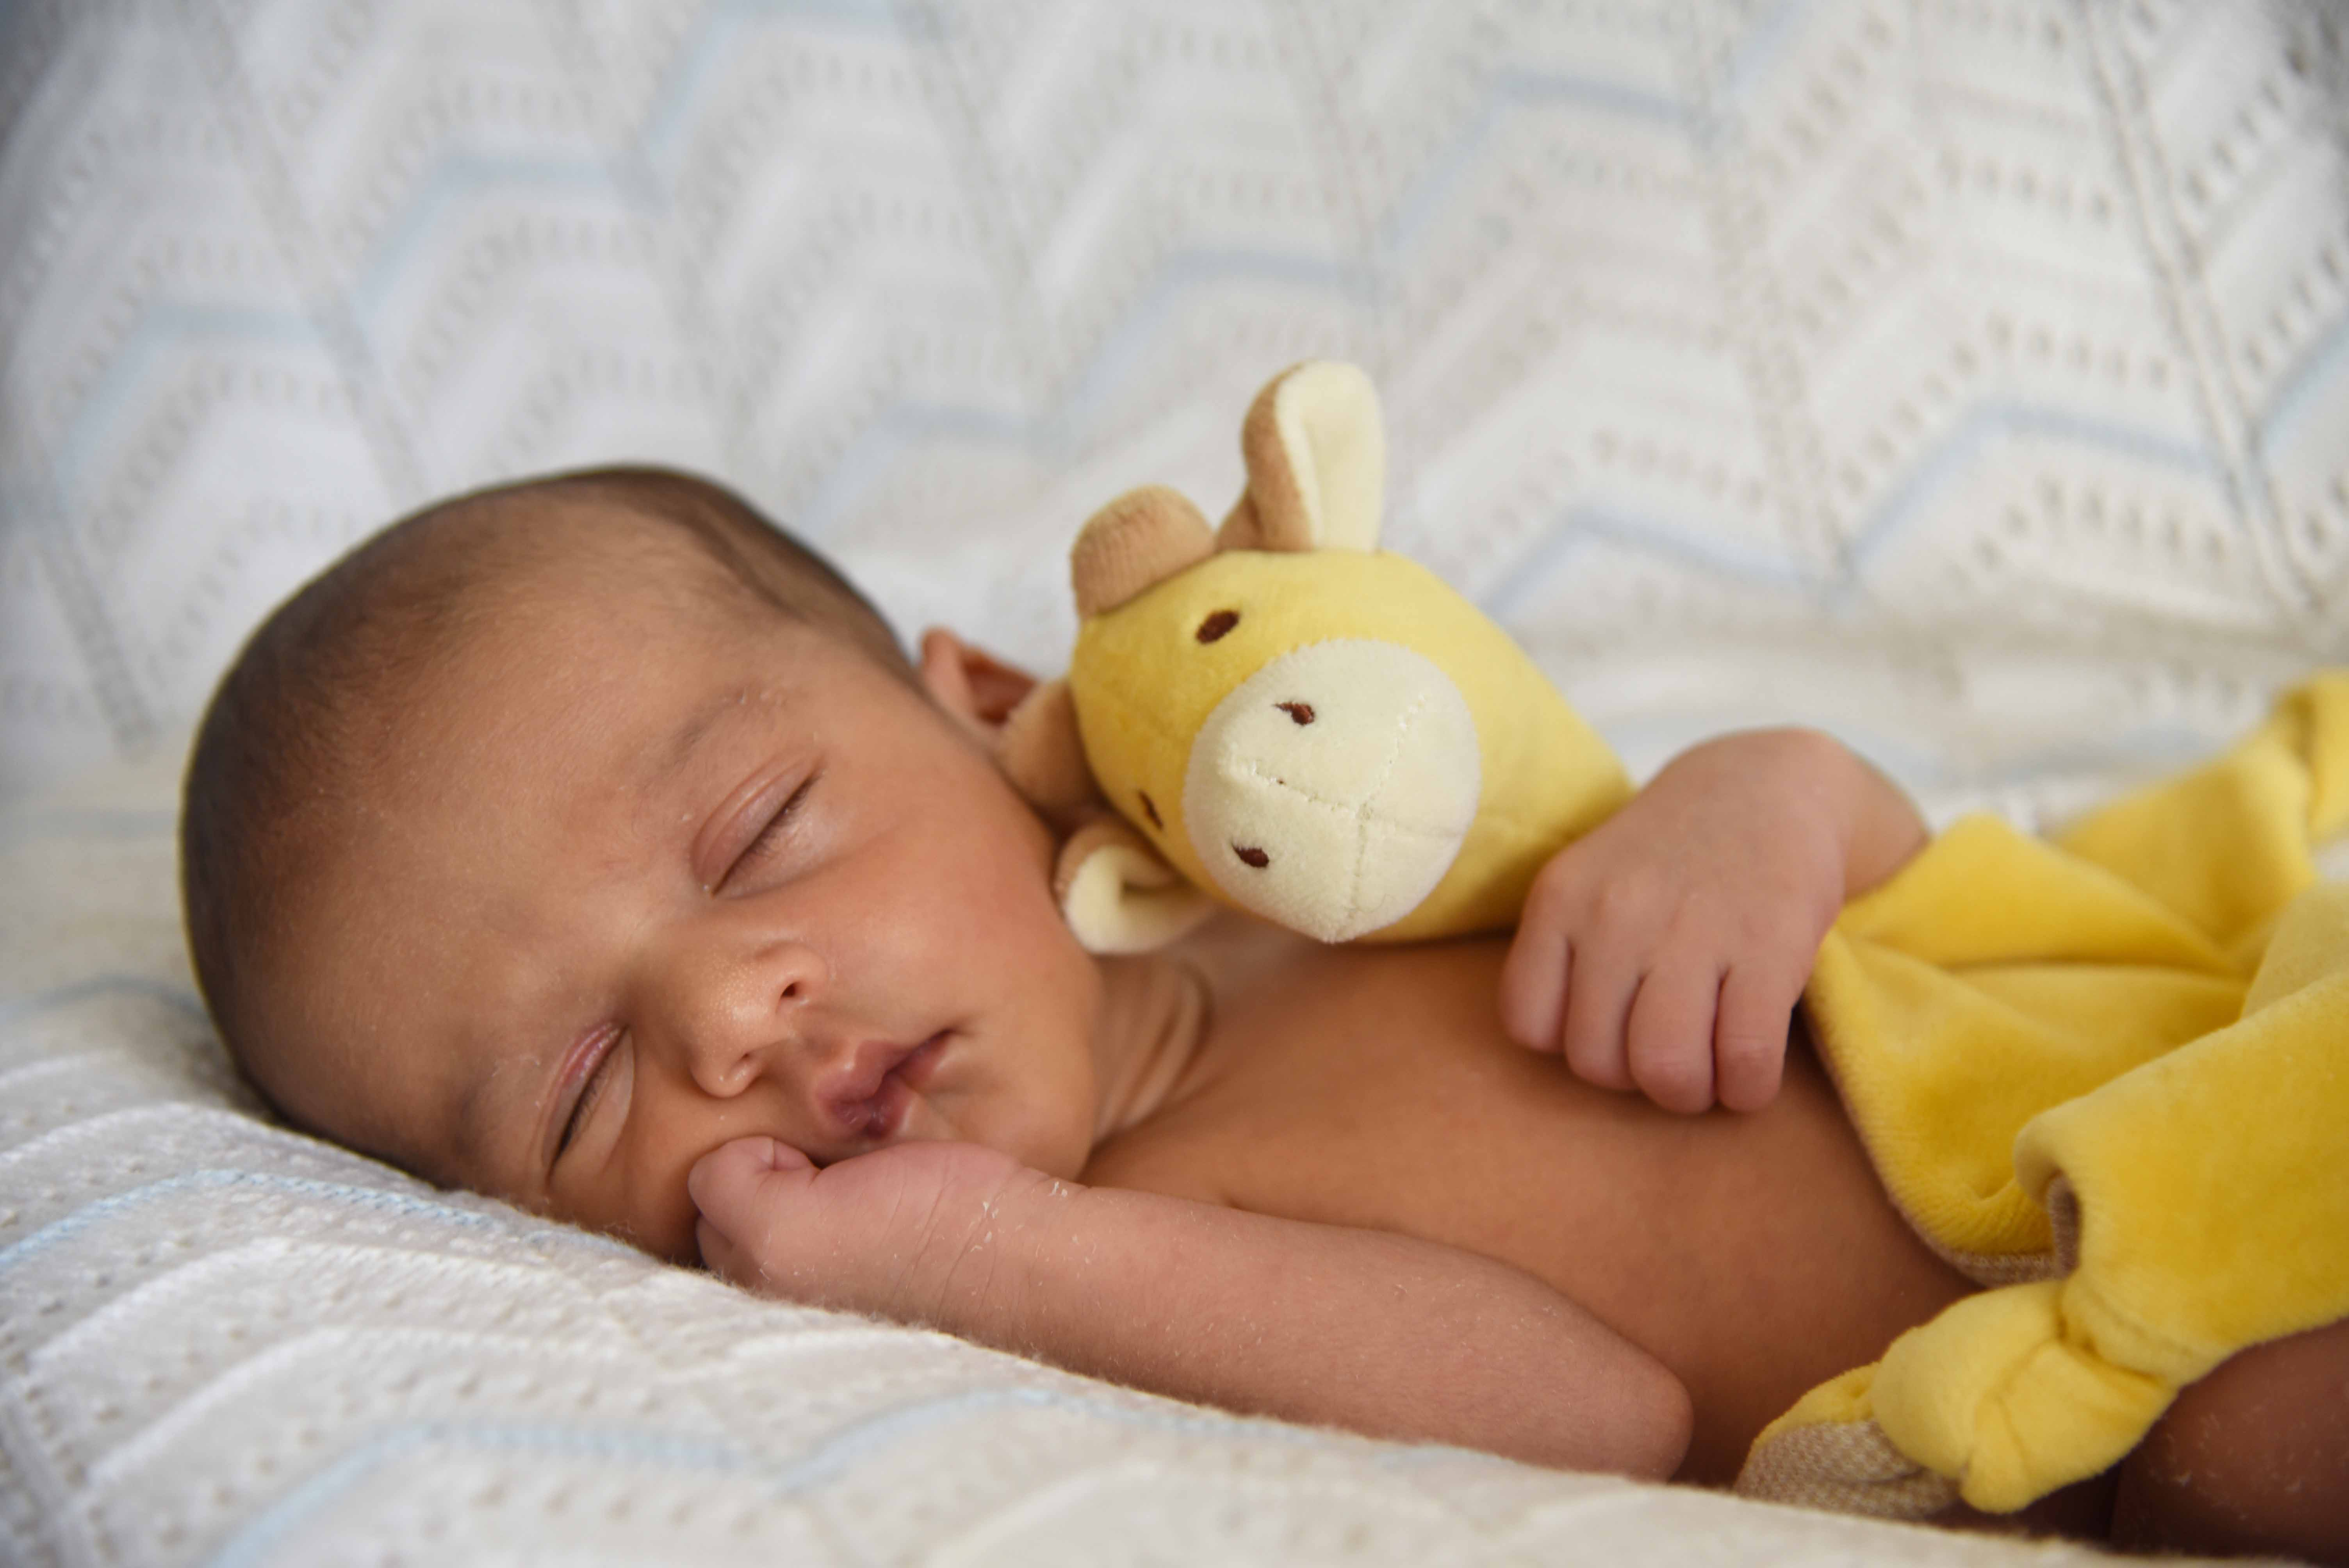 Shruttigarg_newborn photography-12